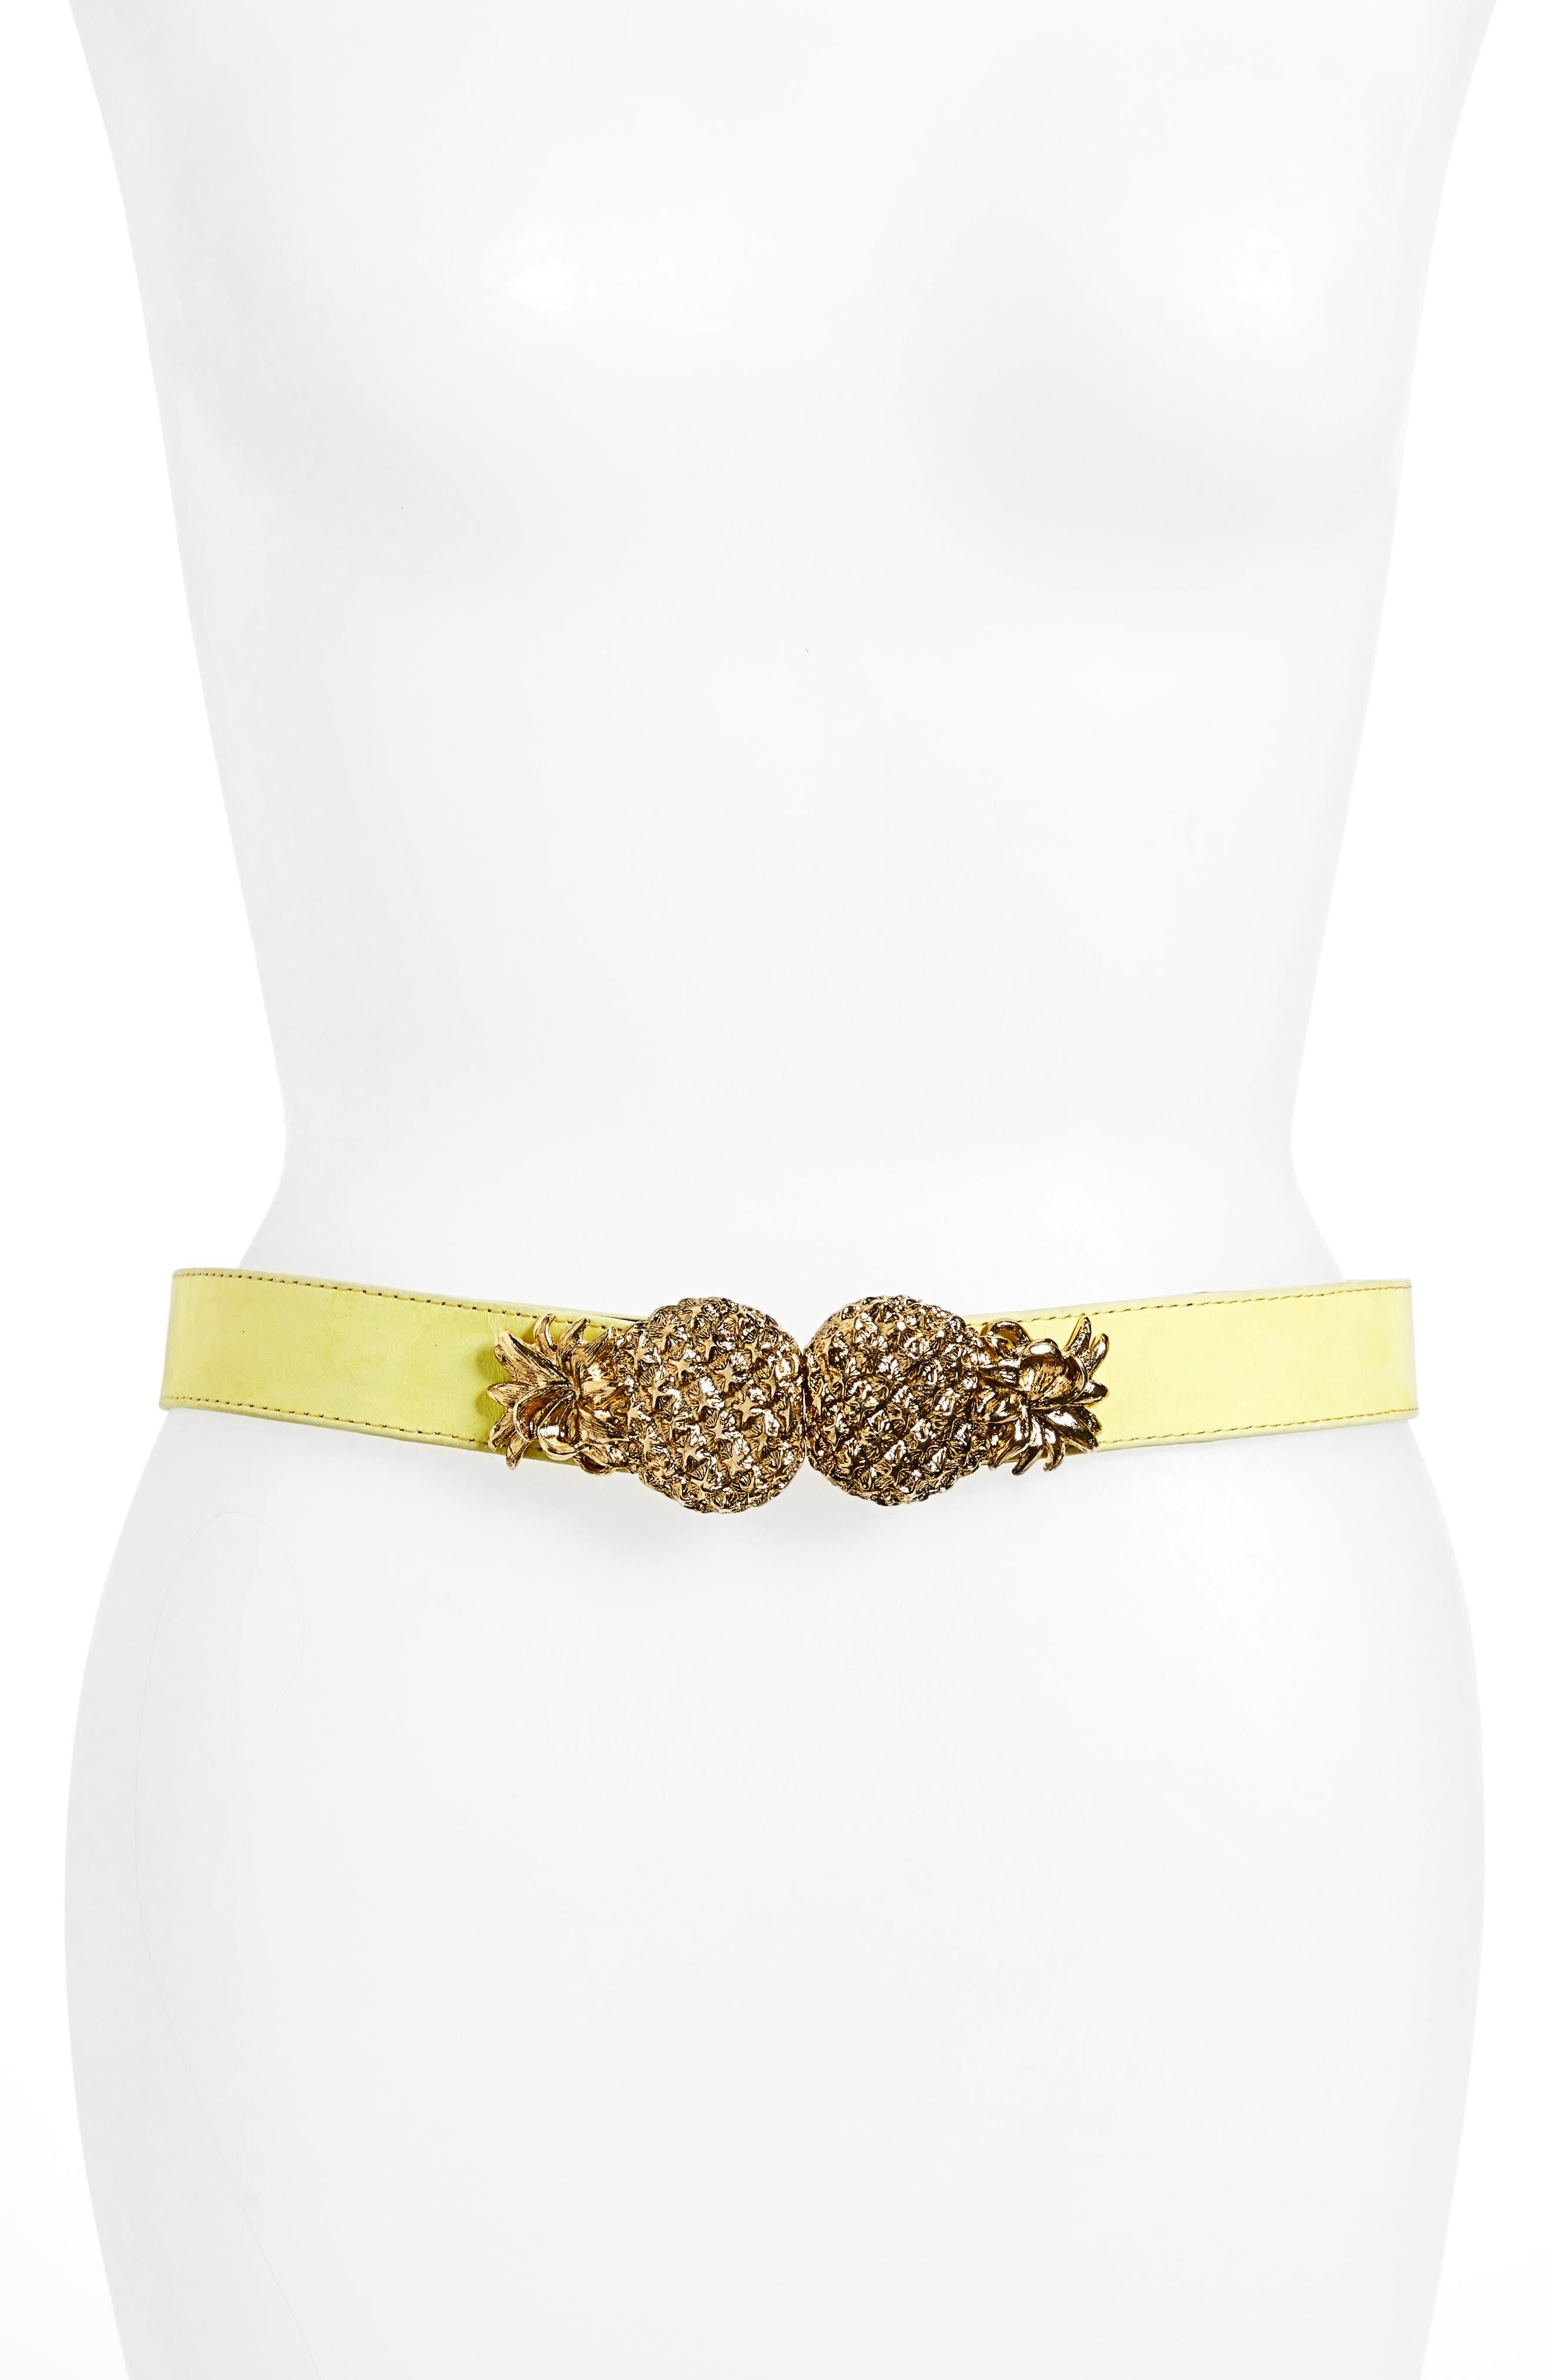 Raina Pina Leather Belt